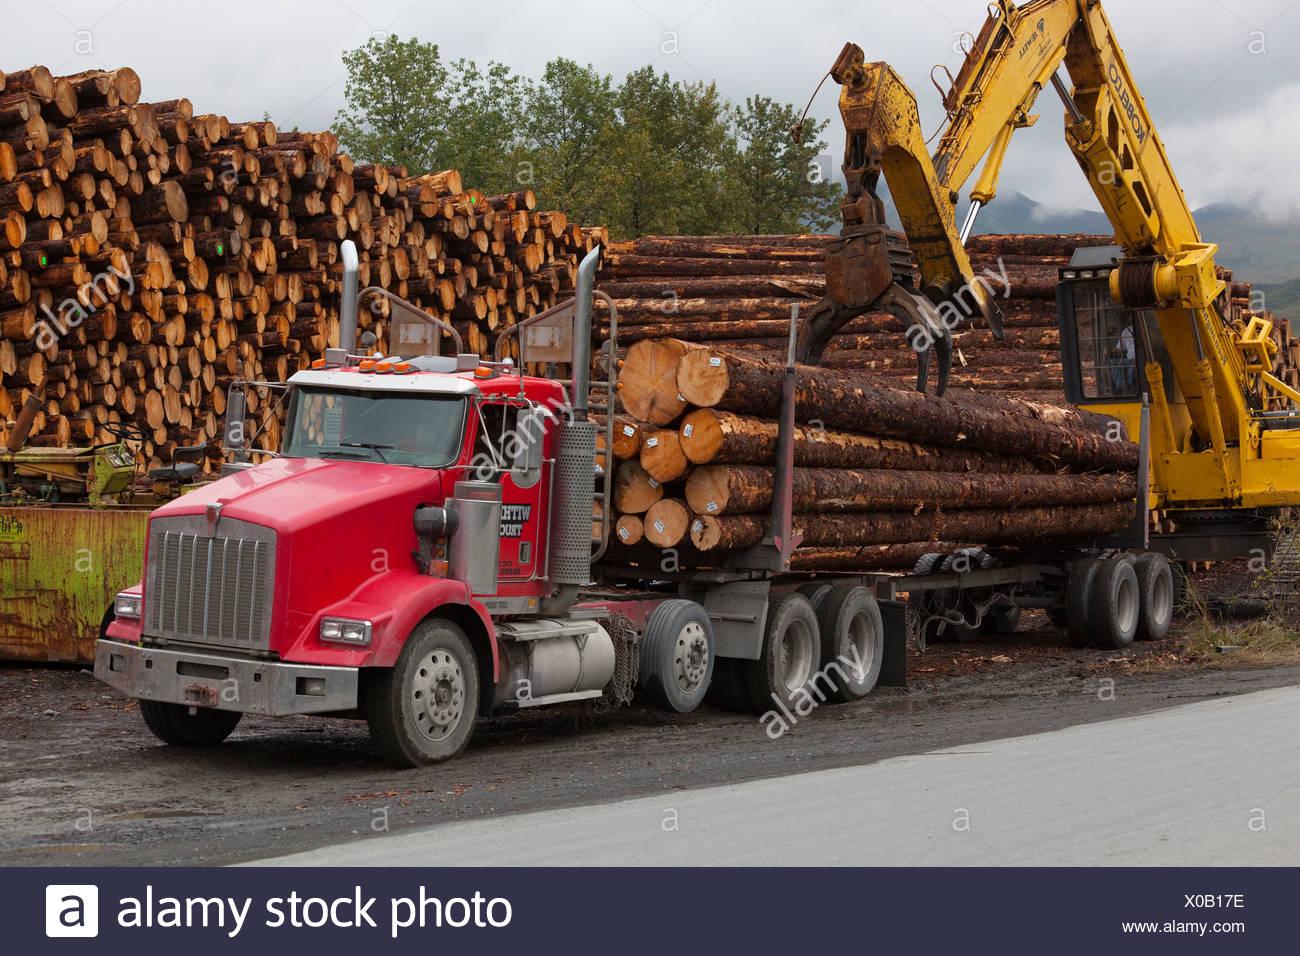 Forwarder Loading Sitka Spruce Logs Harvested At Chiniak Onto A Logging Truck, Kodiak Island, Southwest Alaska, Autumn Stock Photo